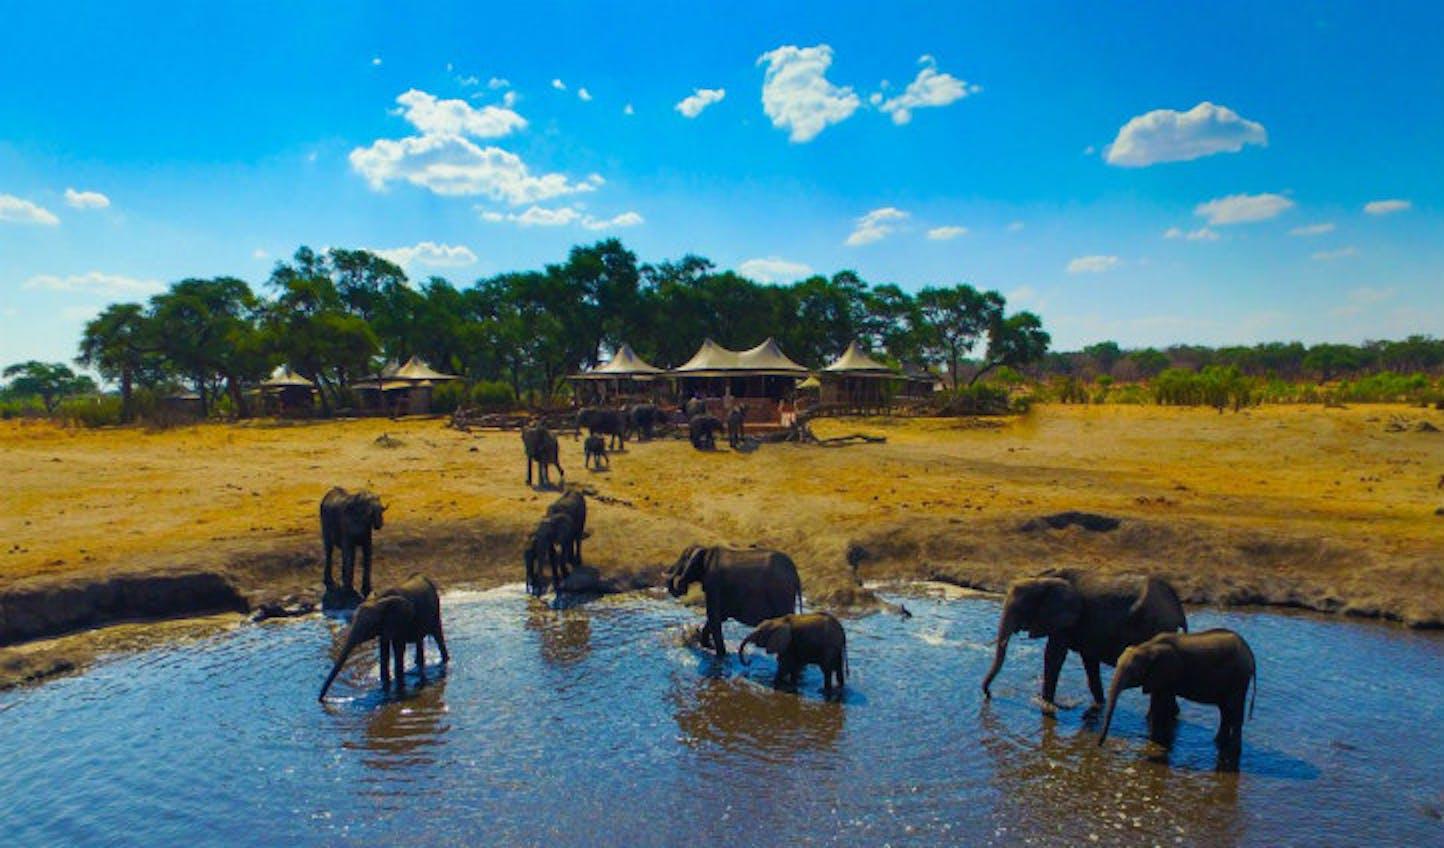 Elephants at the watering hole, Somalisa | Black Tomato